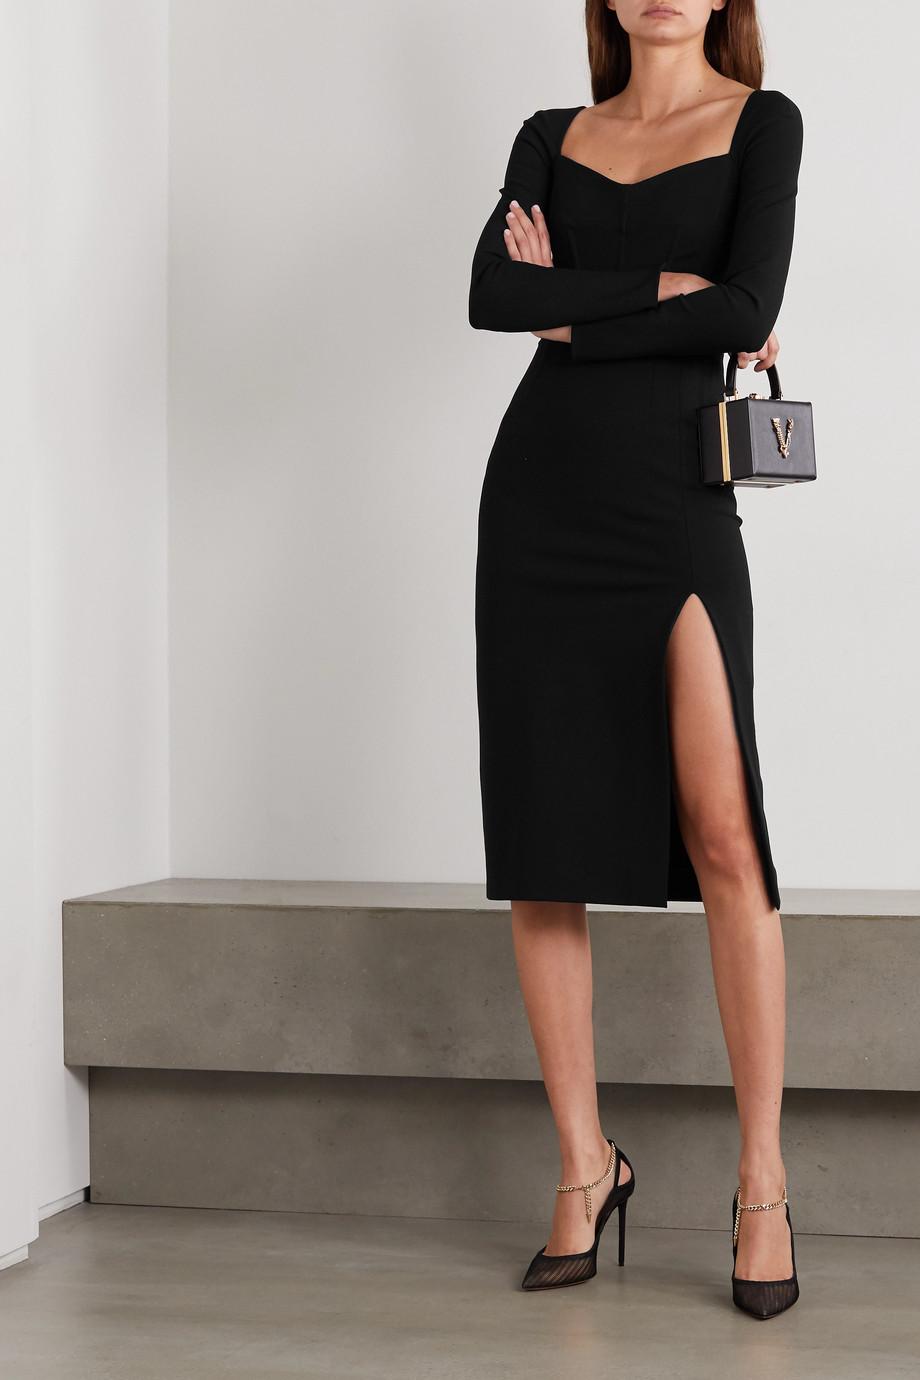 Dolce & Gabbana Woven dress